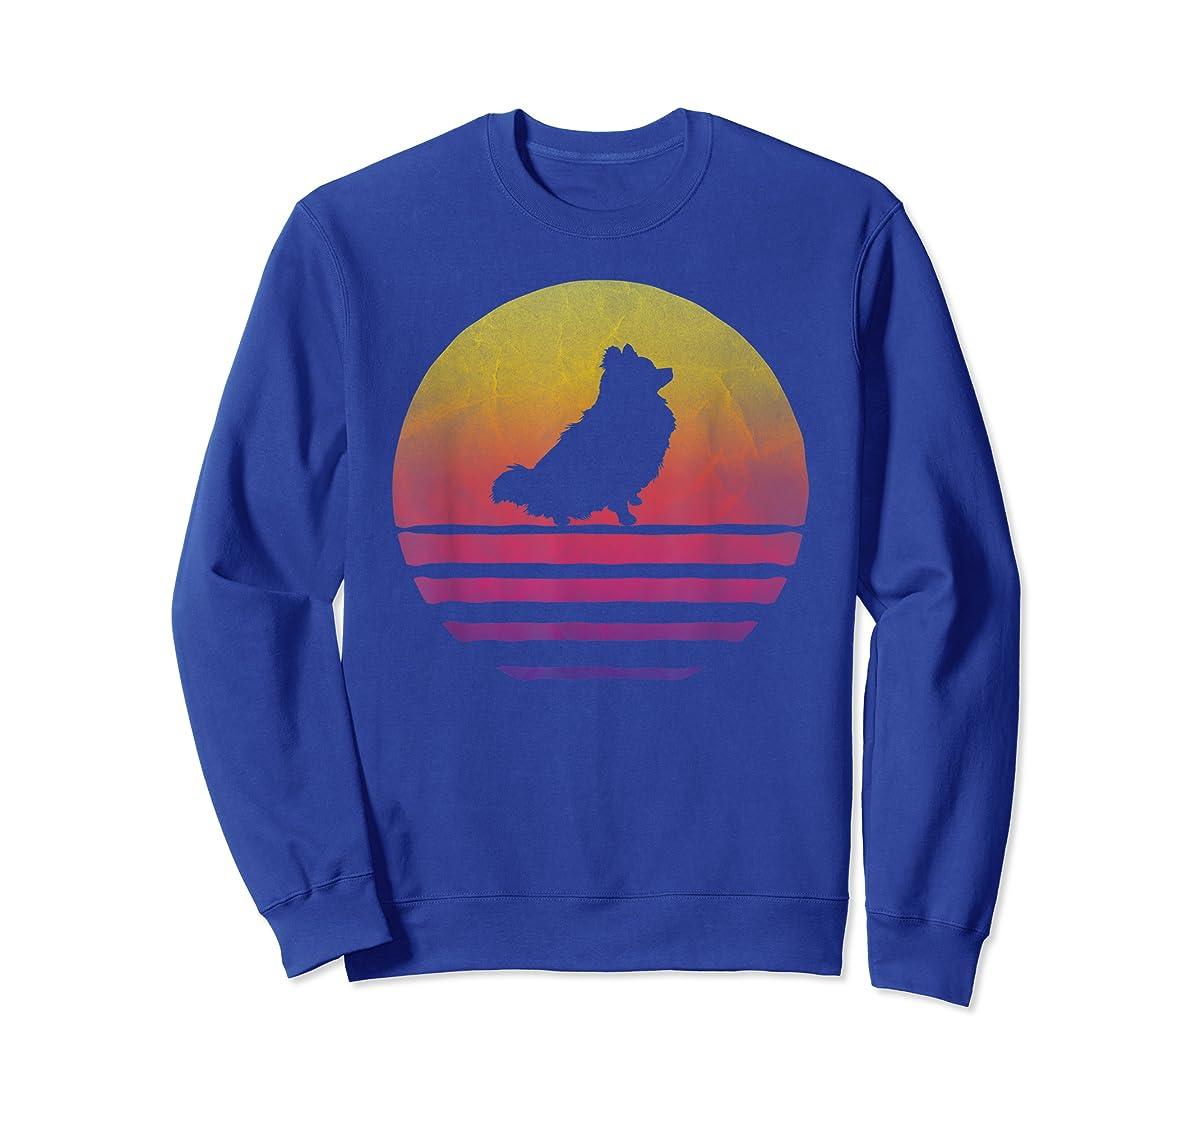 Retro Vintage Sunset Pomeranian Dog Lover Silhouette Gift T-Shirt-Sweatshirt-Royal